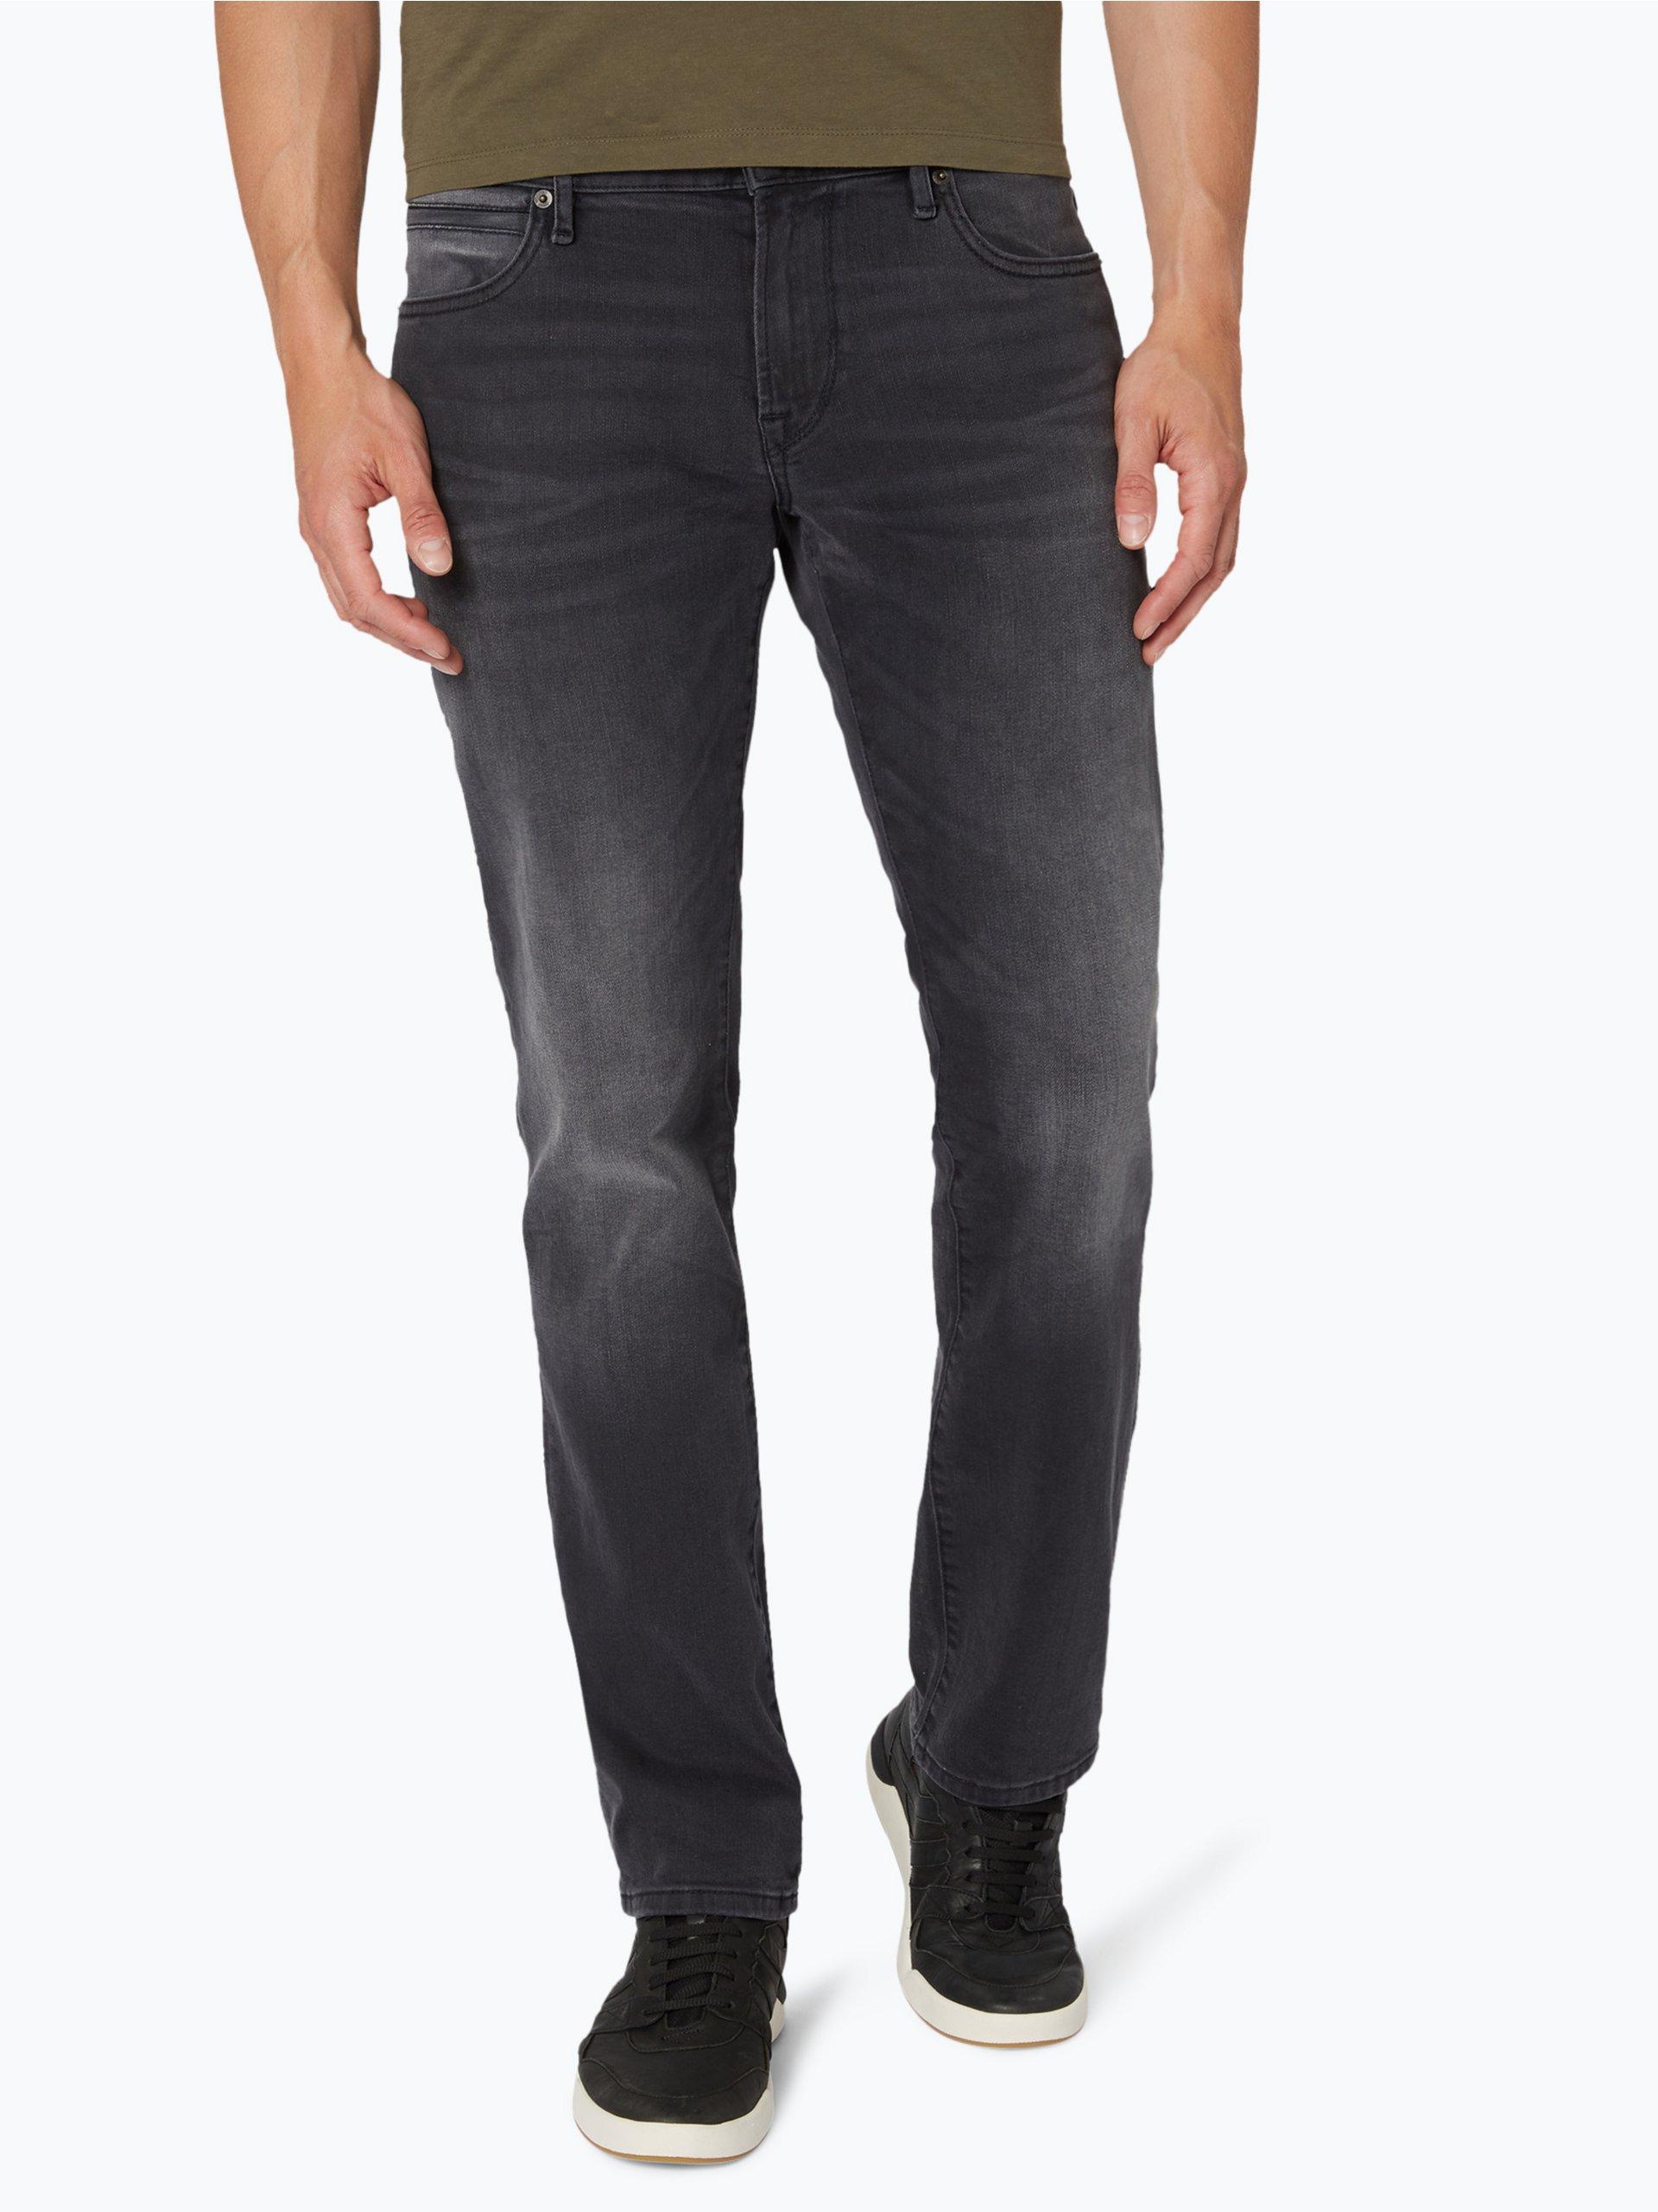 boss casual herren jeans barcelona anthrazit uni online kaufen peek und cloppenburg de. Black Bedroom Furniture Sets. Home Design Ideas